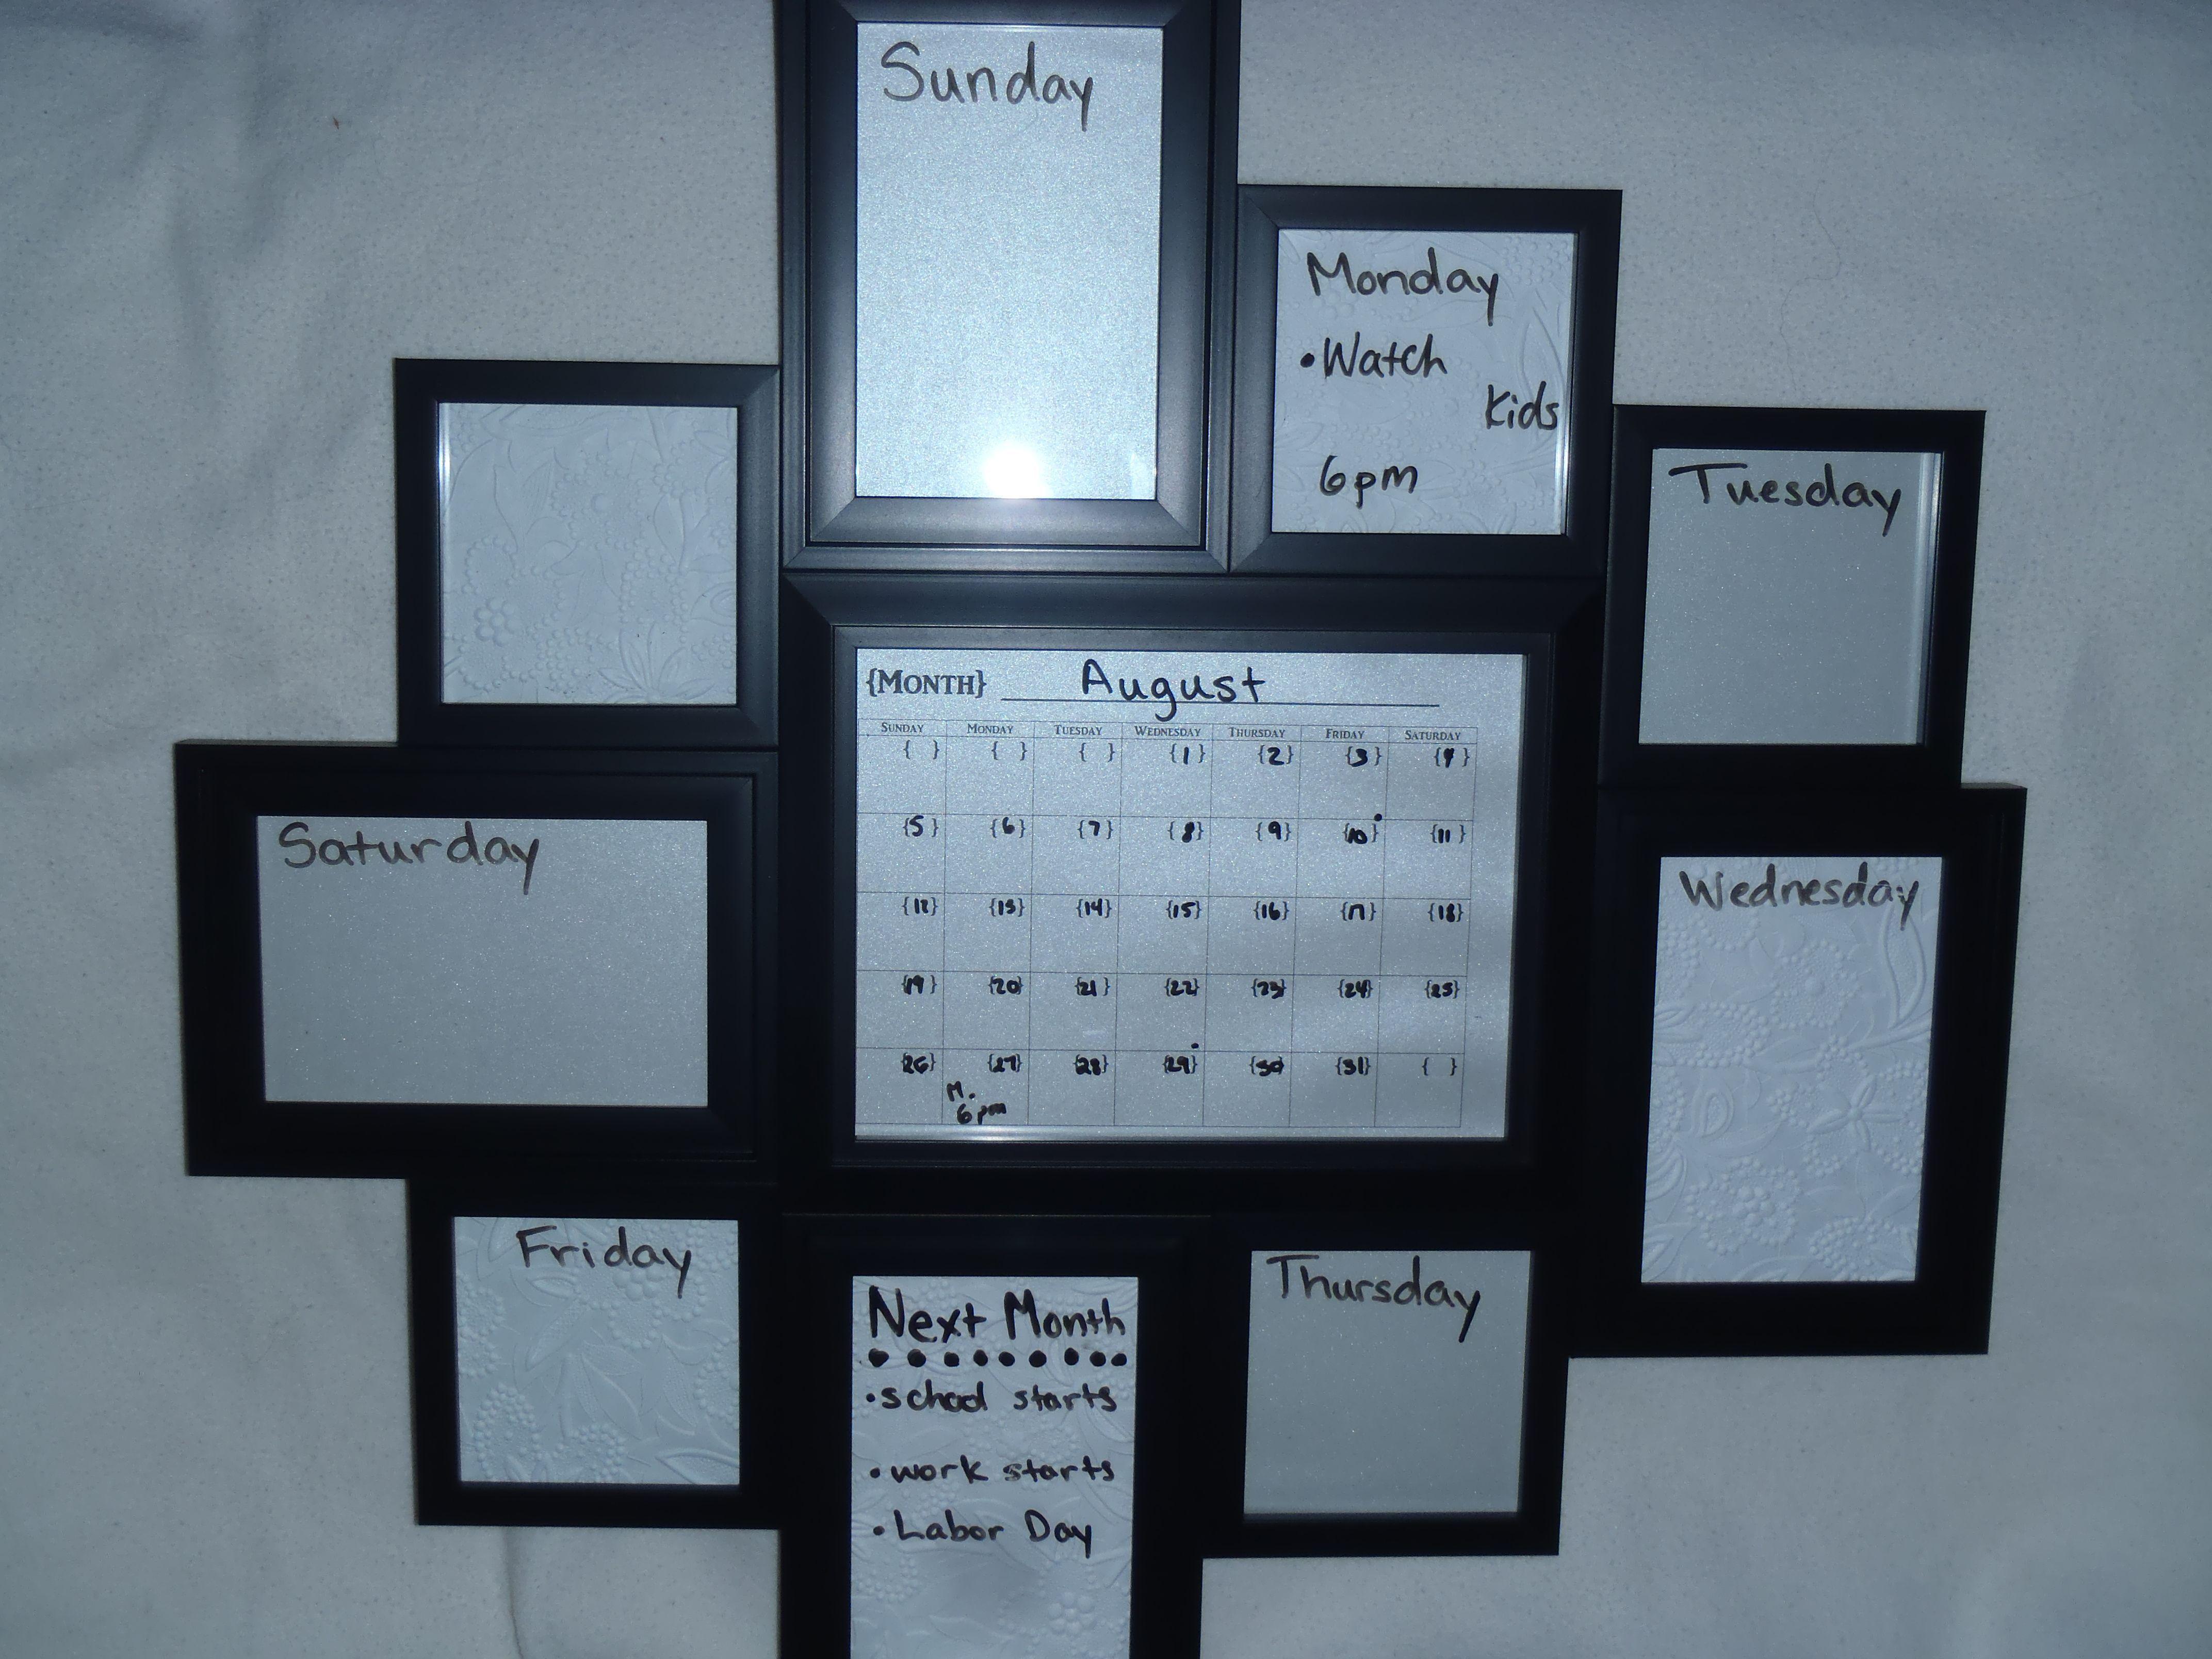 DIY Family Calendar and weekly reminder board.  DIY Family Calendar and weekly r...  DIY Family Calendar and weekly reminder board.  DIY Family Calendar and weekly reminder board.  #Bo #Board #calendar #DIY #Family #reminder #Weekly